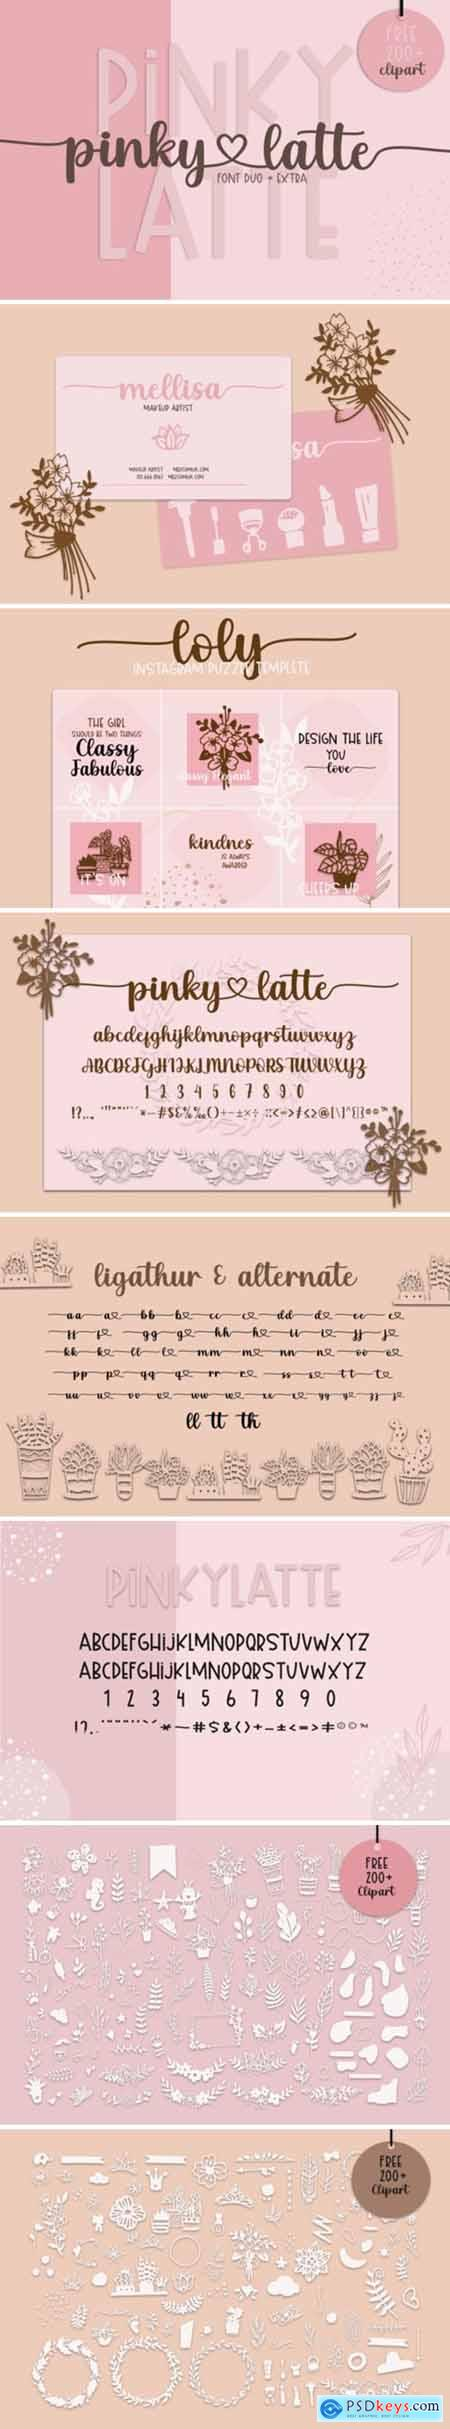 Pinky Latte Font